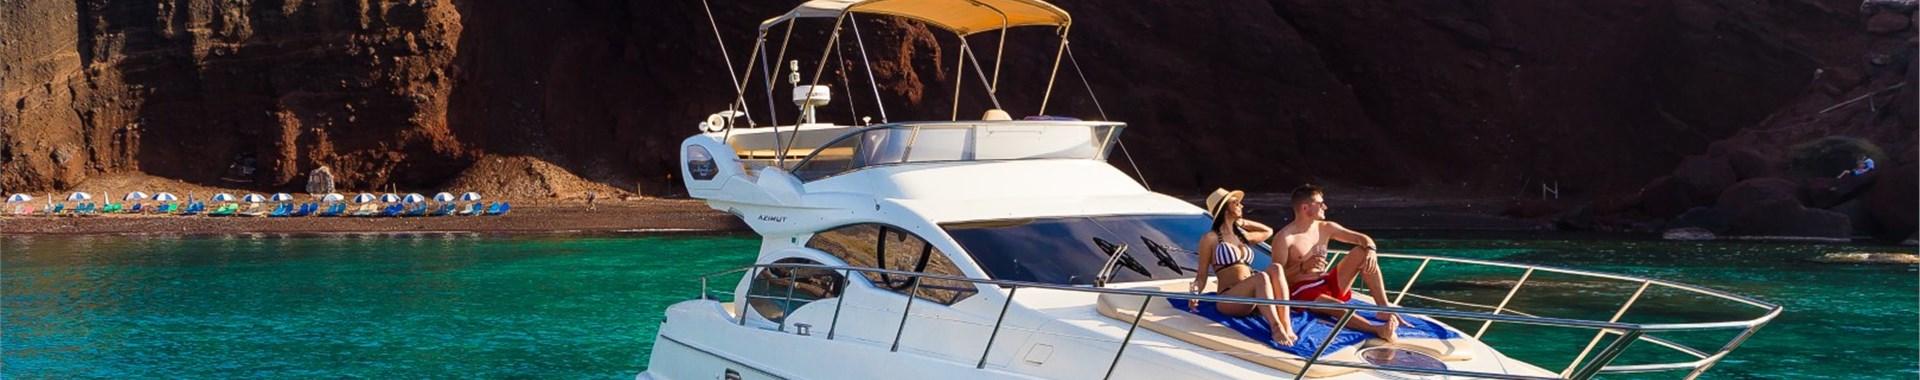 Private Boat Tours in Santorini